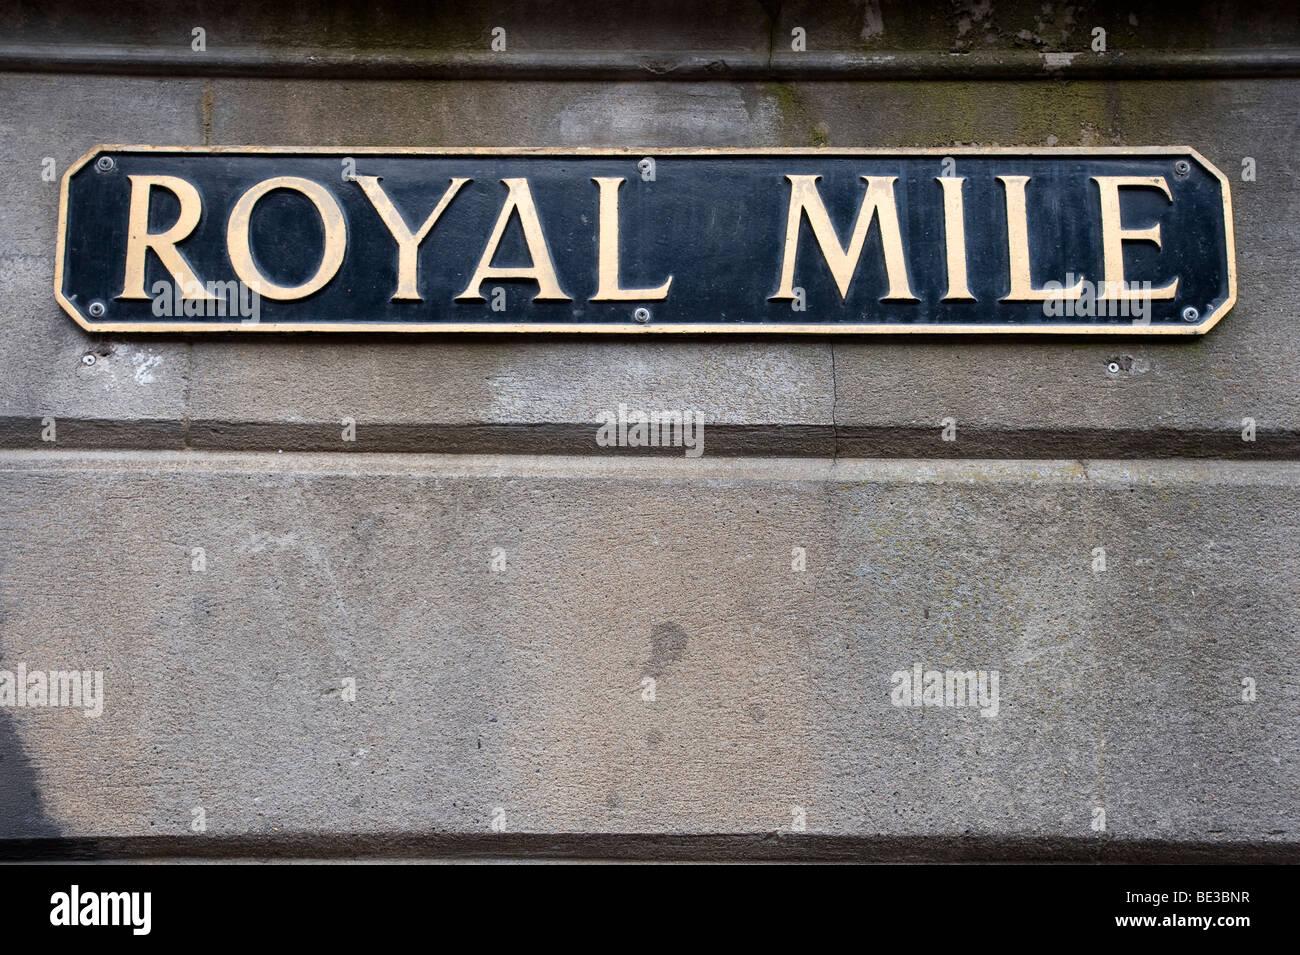 Royal Mile, street sign, Edinburgh, Scotland, United Kingdom, Europe - Stock Image